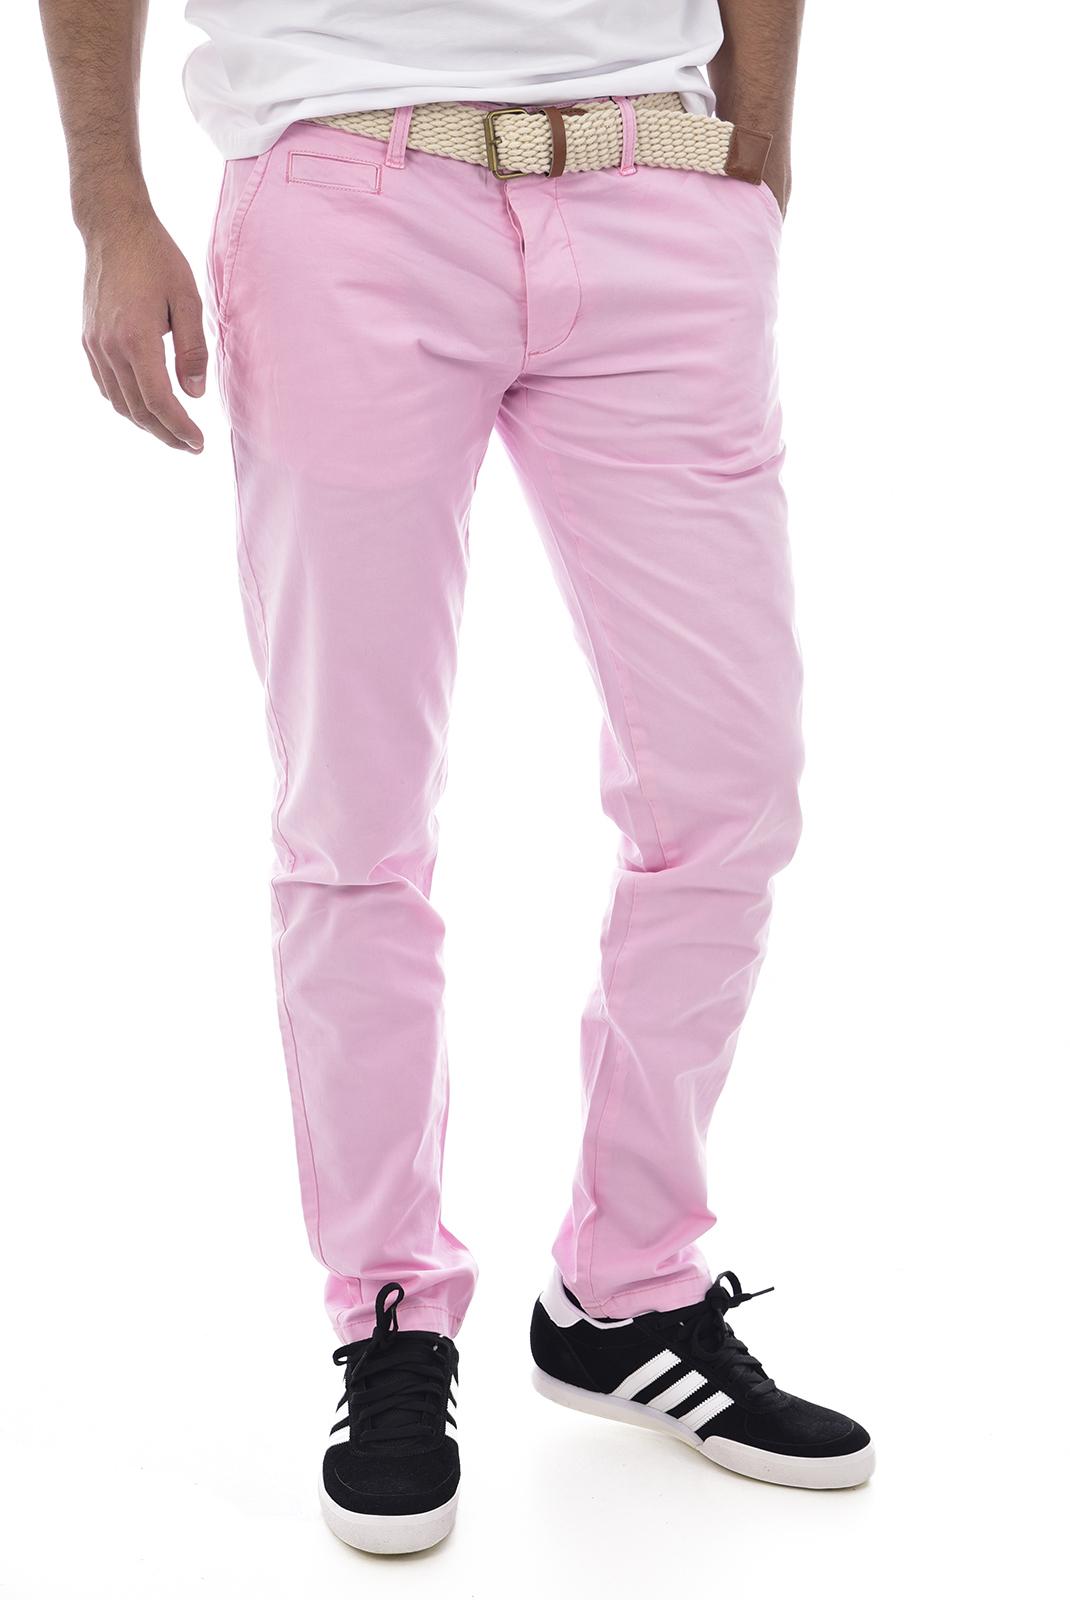 Pantalons chino/citadin  Backlight ALLEN VIEUX ROSE